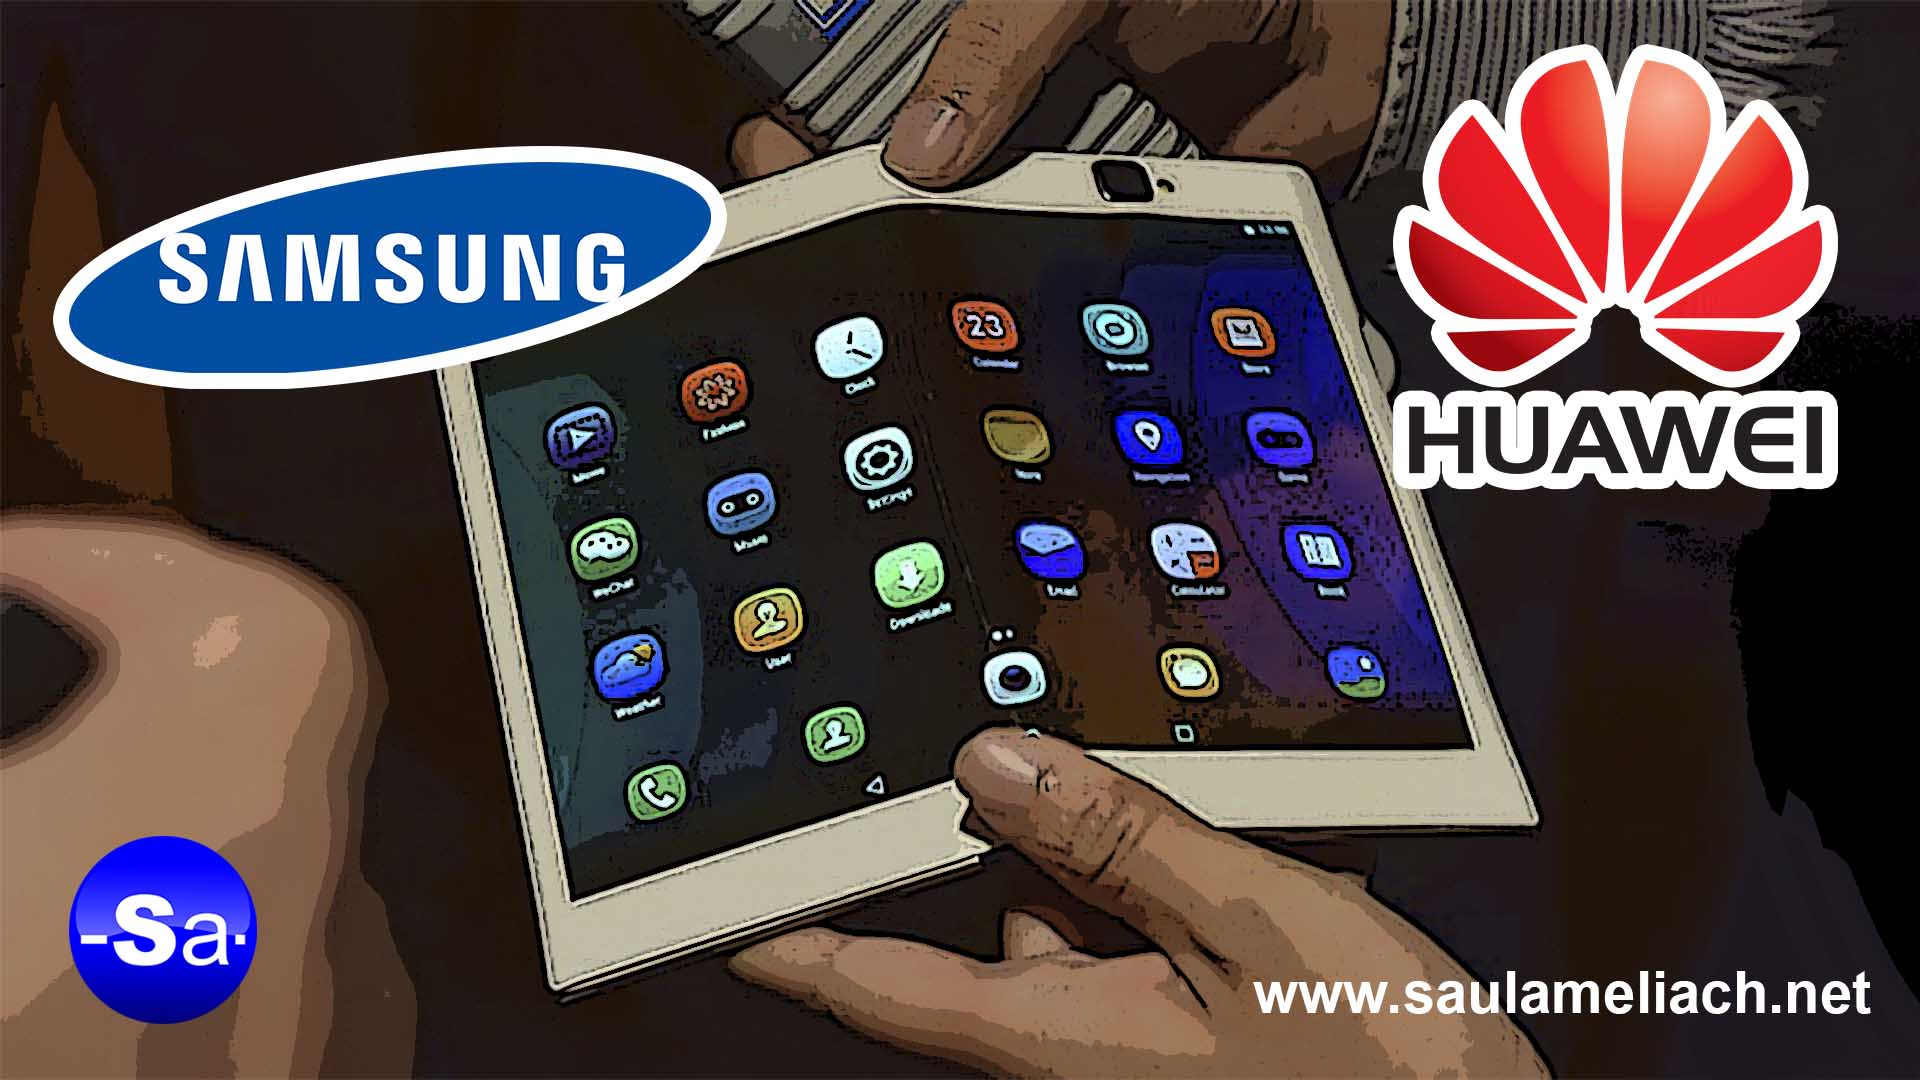 saul ameliach - Samsung y Huawei Pioneros en modelos plegables